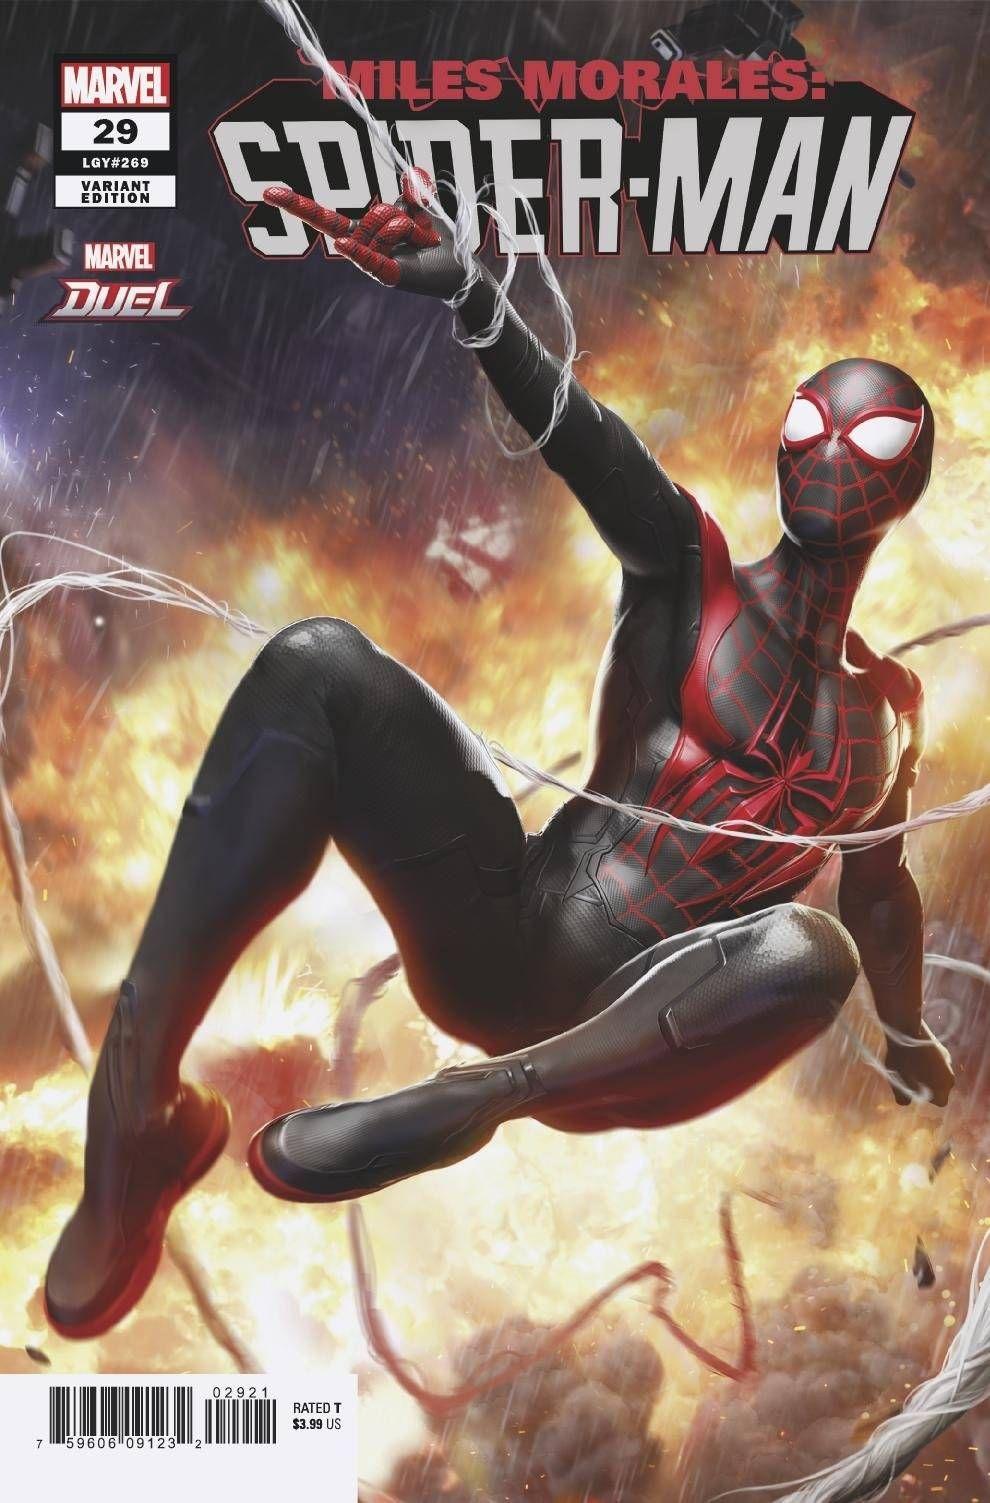 eyJidWNrZXQiOiJnb2NvbGxlY3QuaW1hZ2VzLnB1YiIsImtleSI6ImJhMDQwNzRkLTg5ODItNDkxNS05MjE1LWFjOTZmMzFiNWRkZC5qcGciLCJlZGl0cyI6W119 ComicList: Marvel Comics New Releases for 08/11/2021